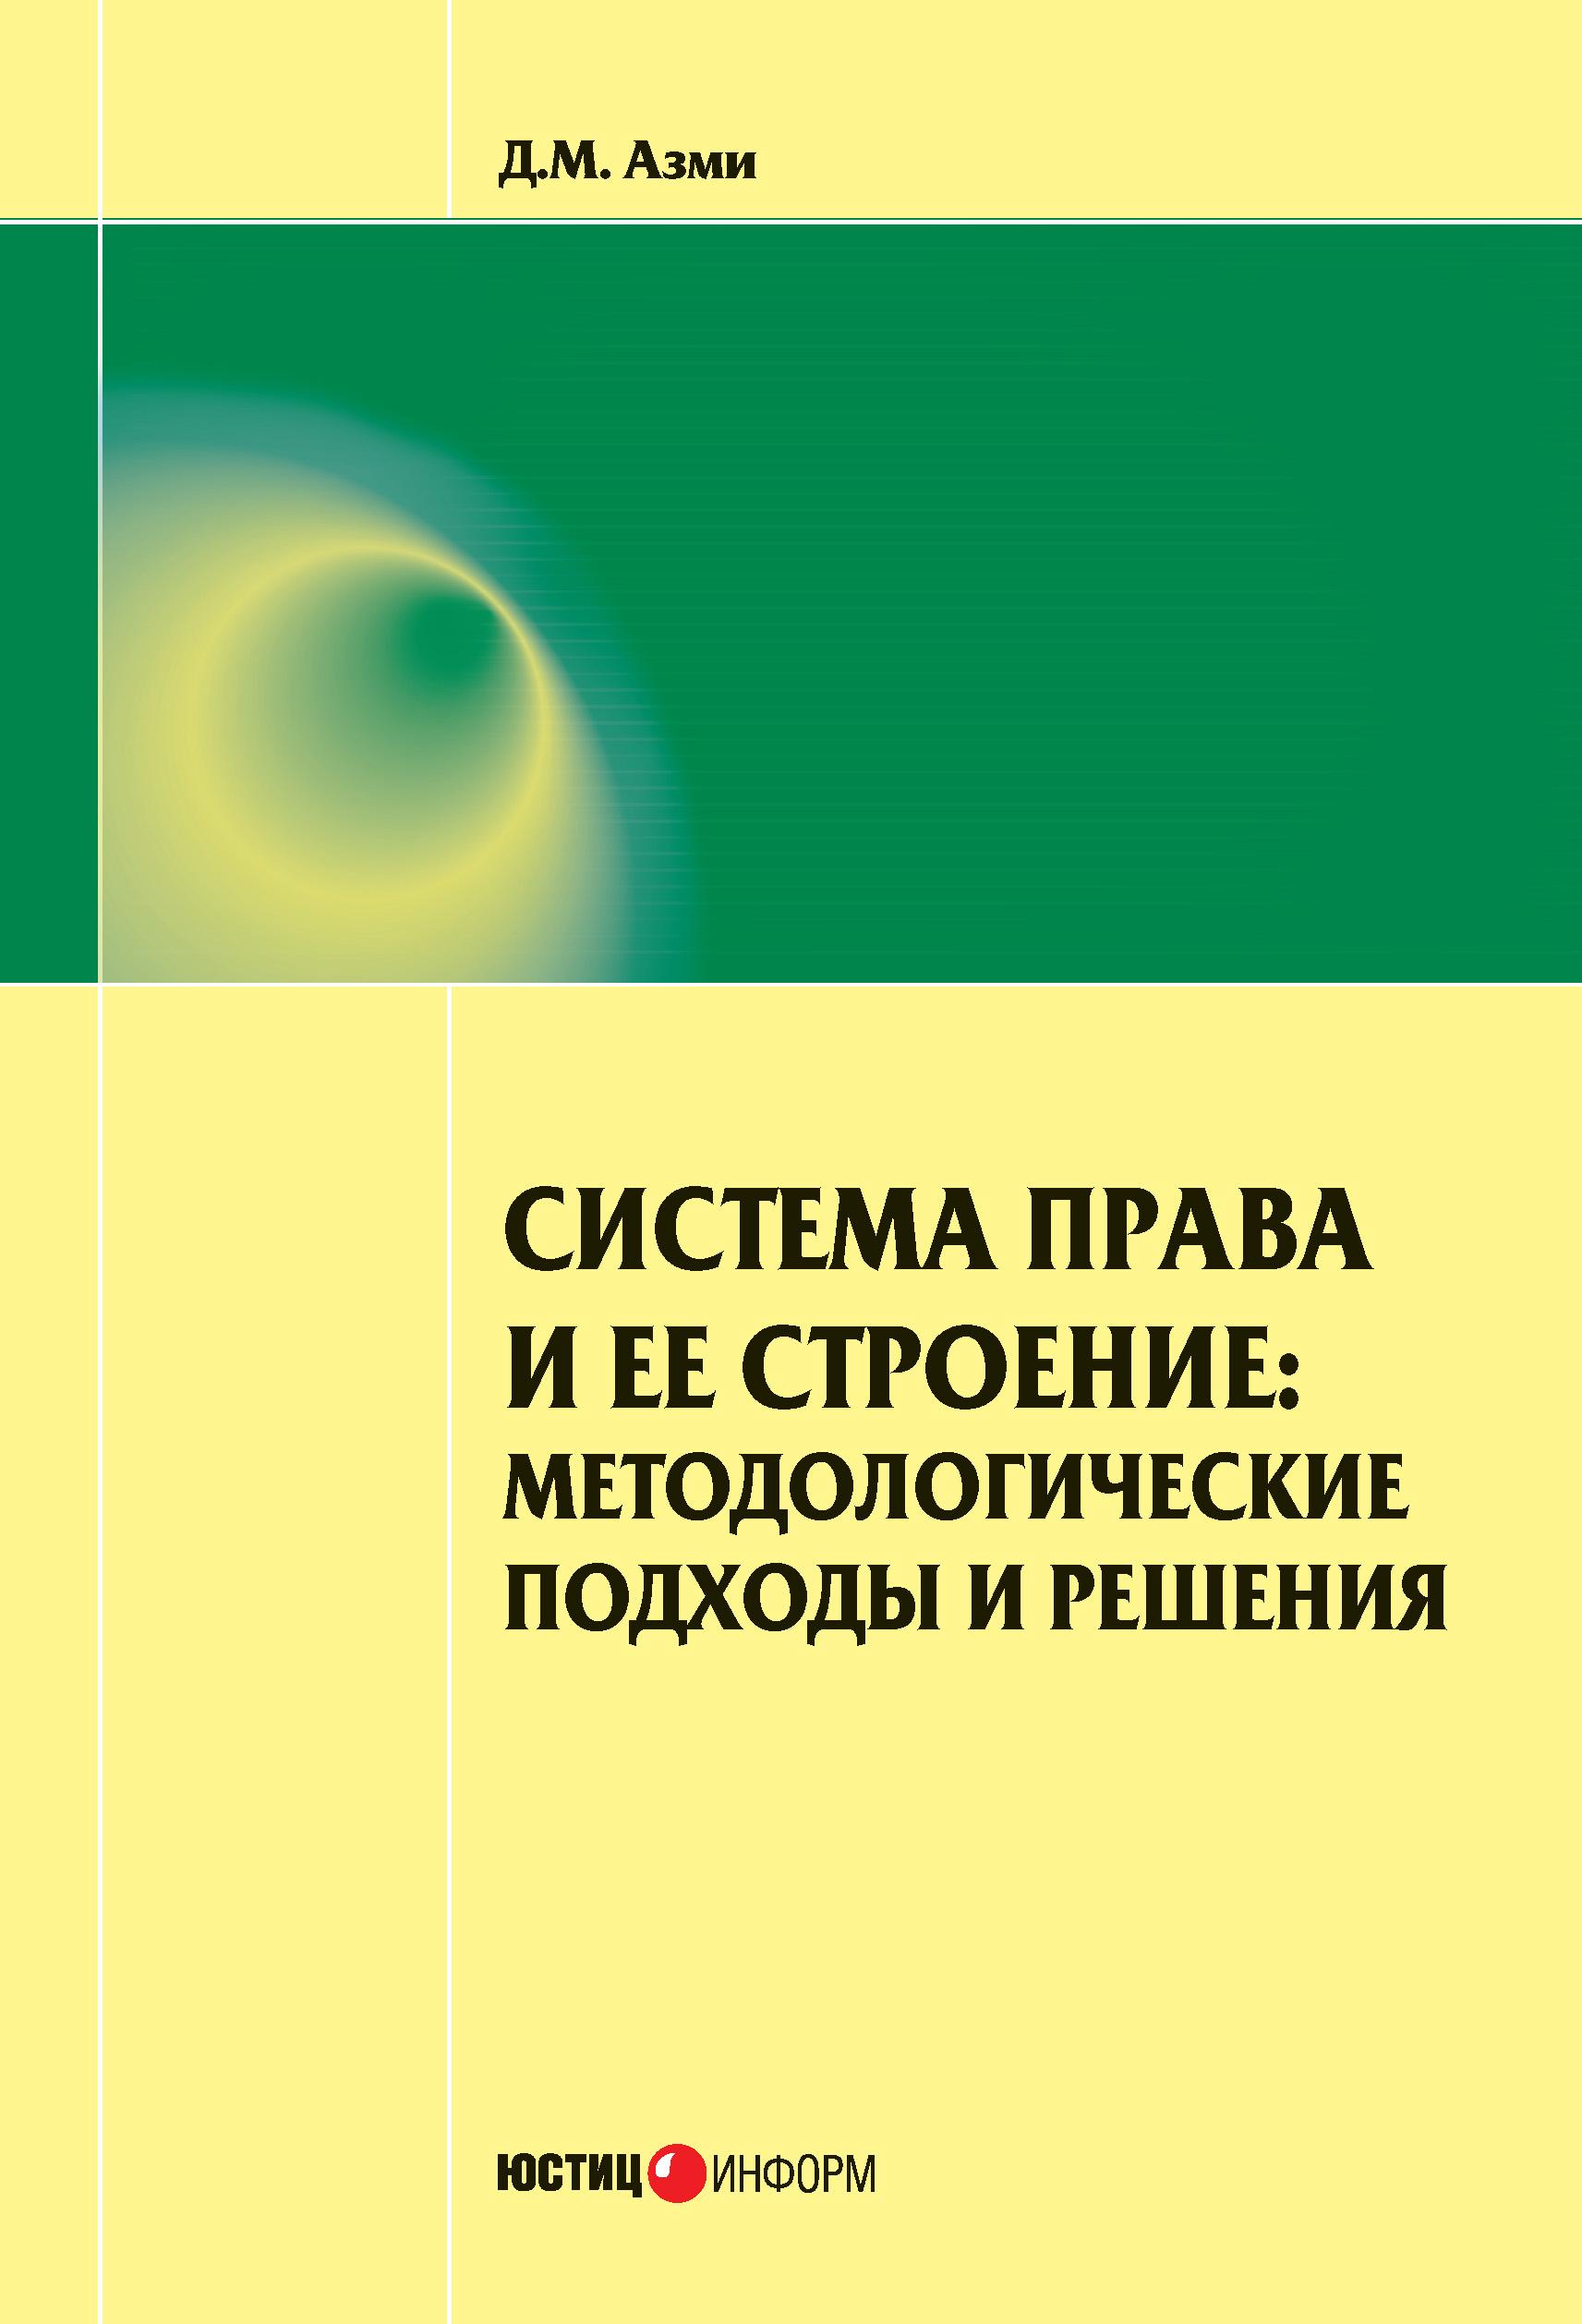 Д. М. Азми Система права и ее строение: методологические подходы и решения цена